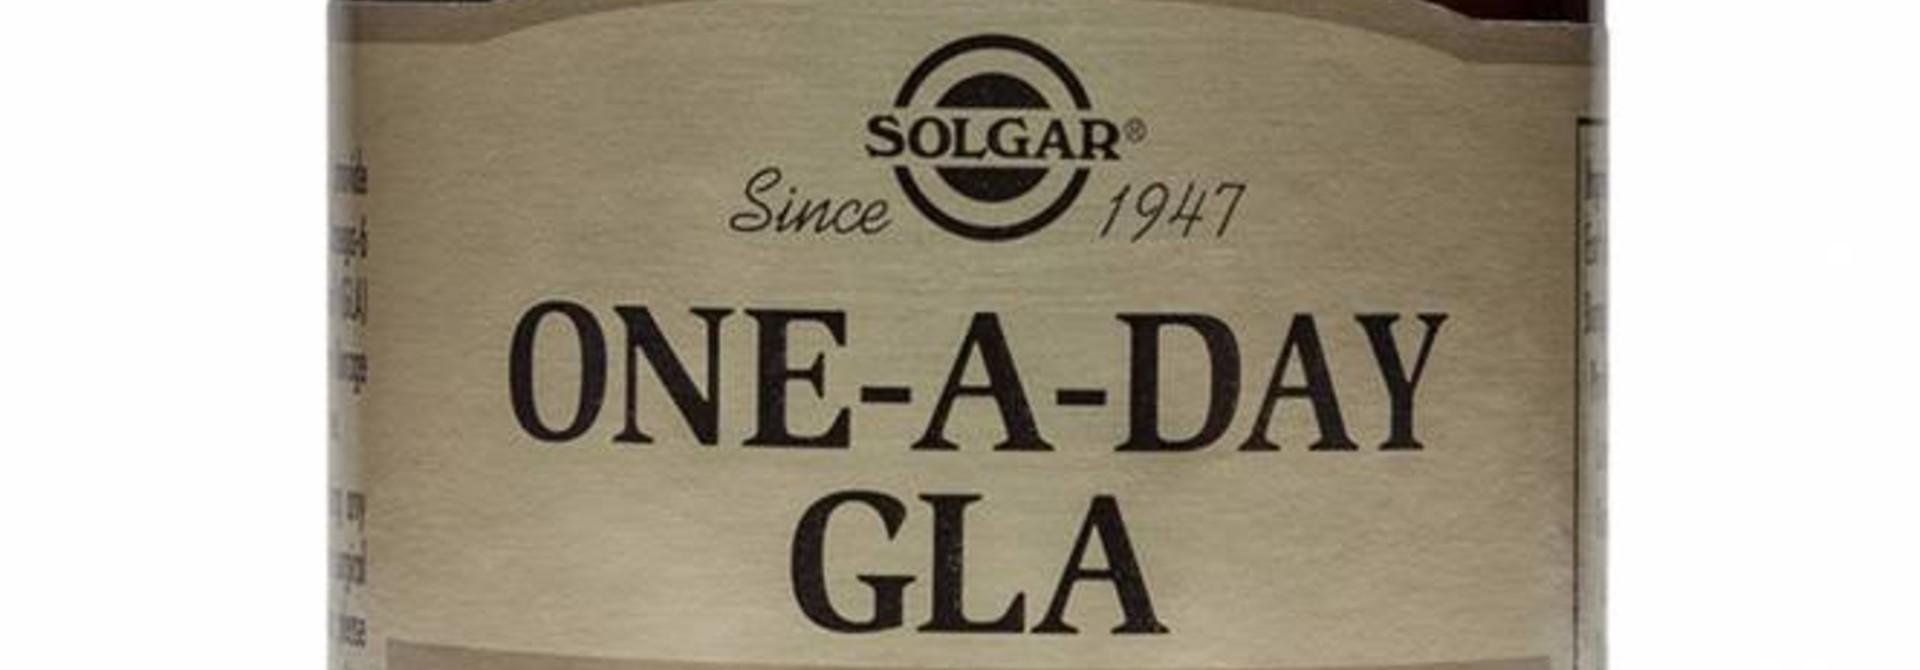 One-a-Day GLA 60 softgels